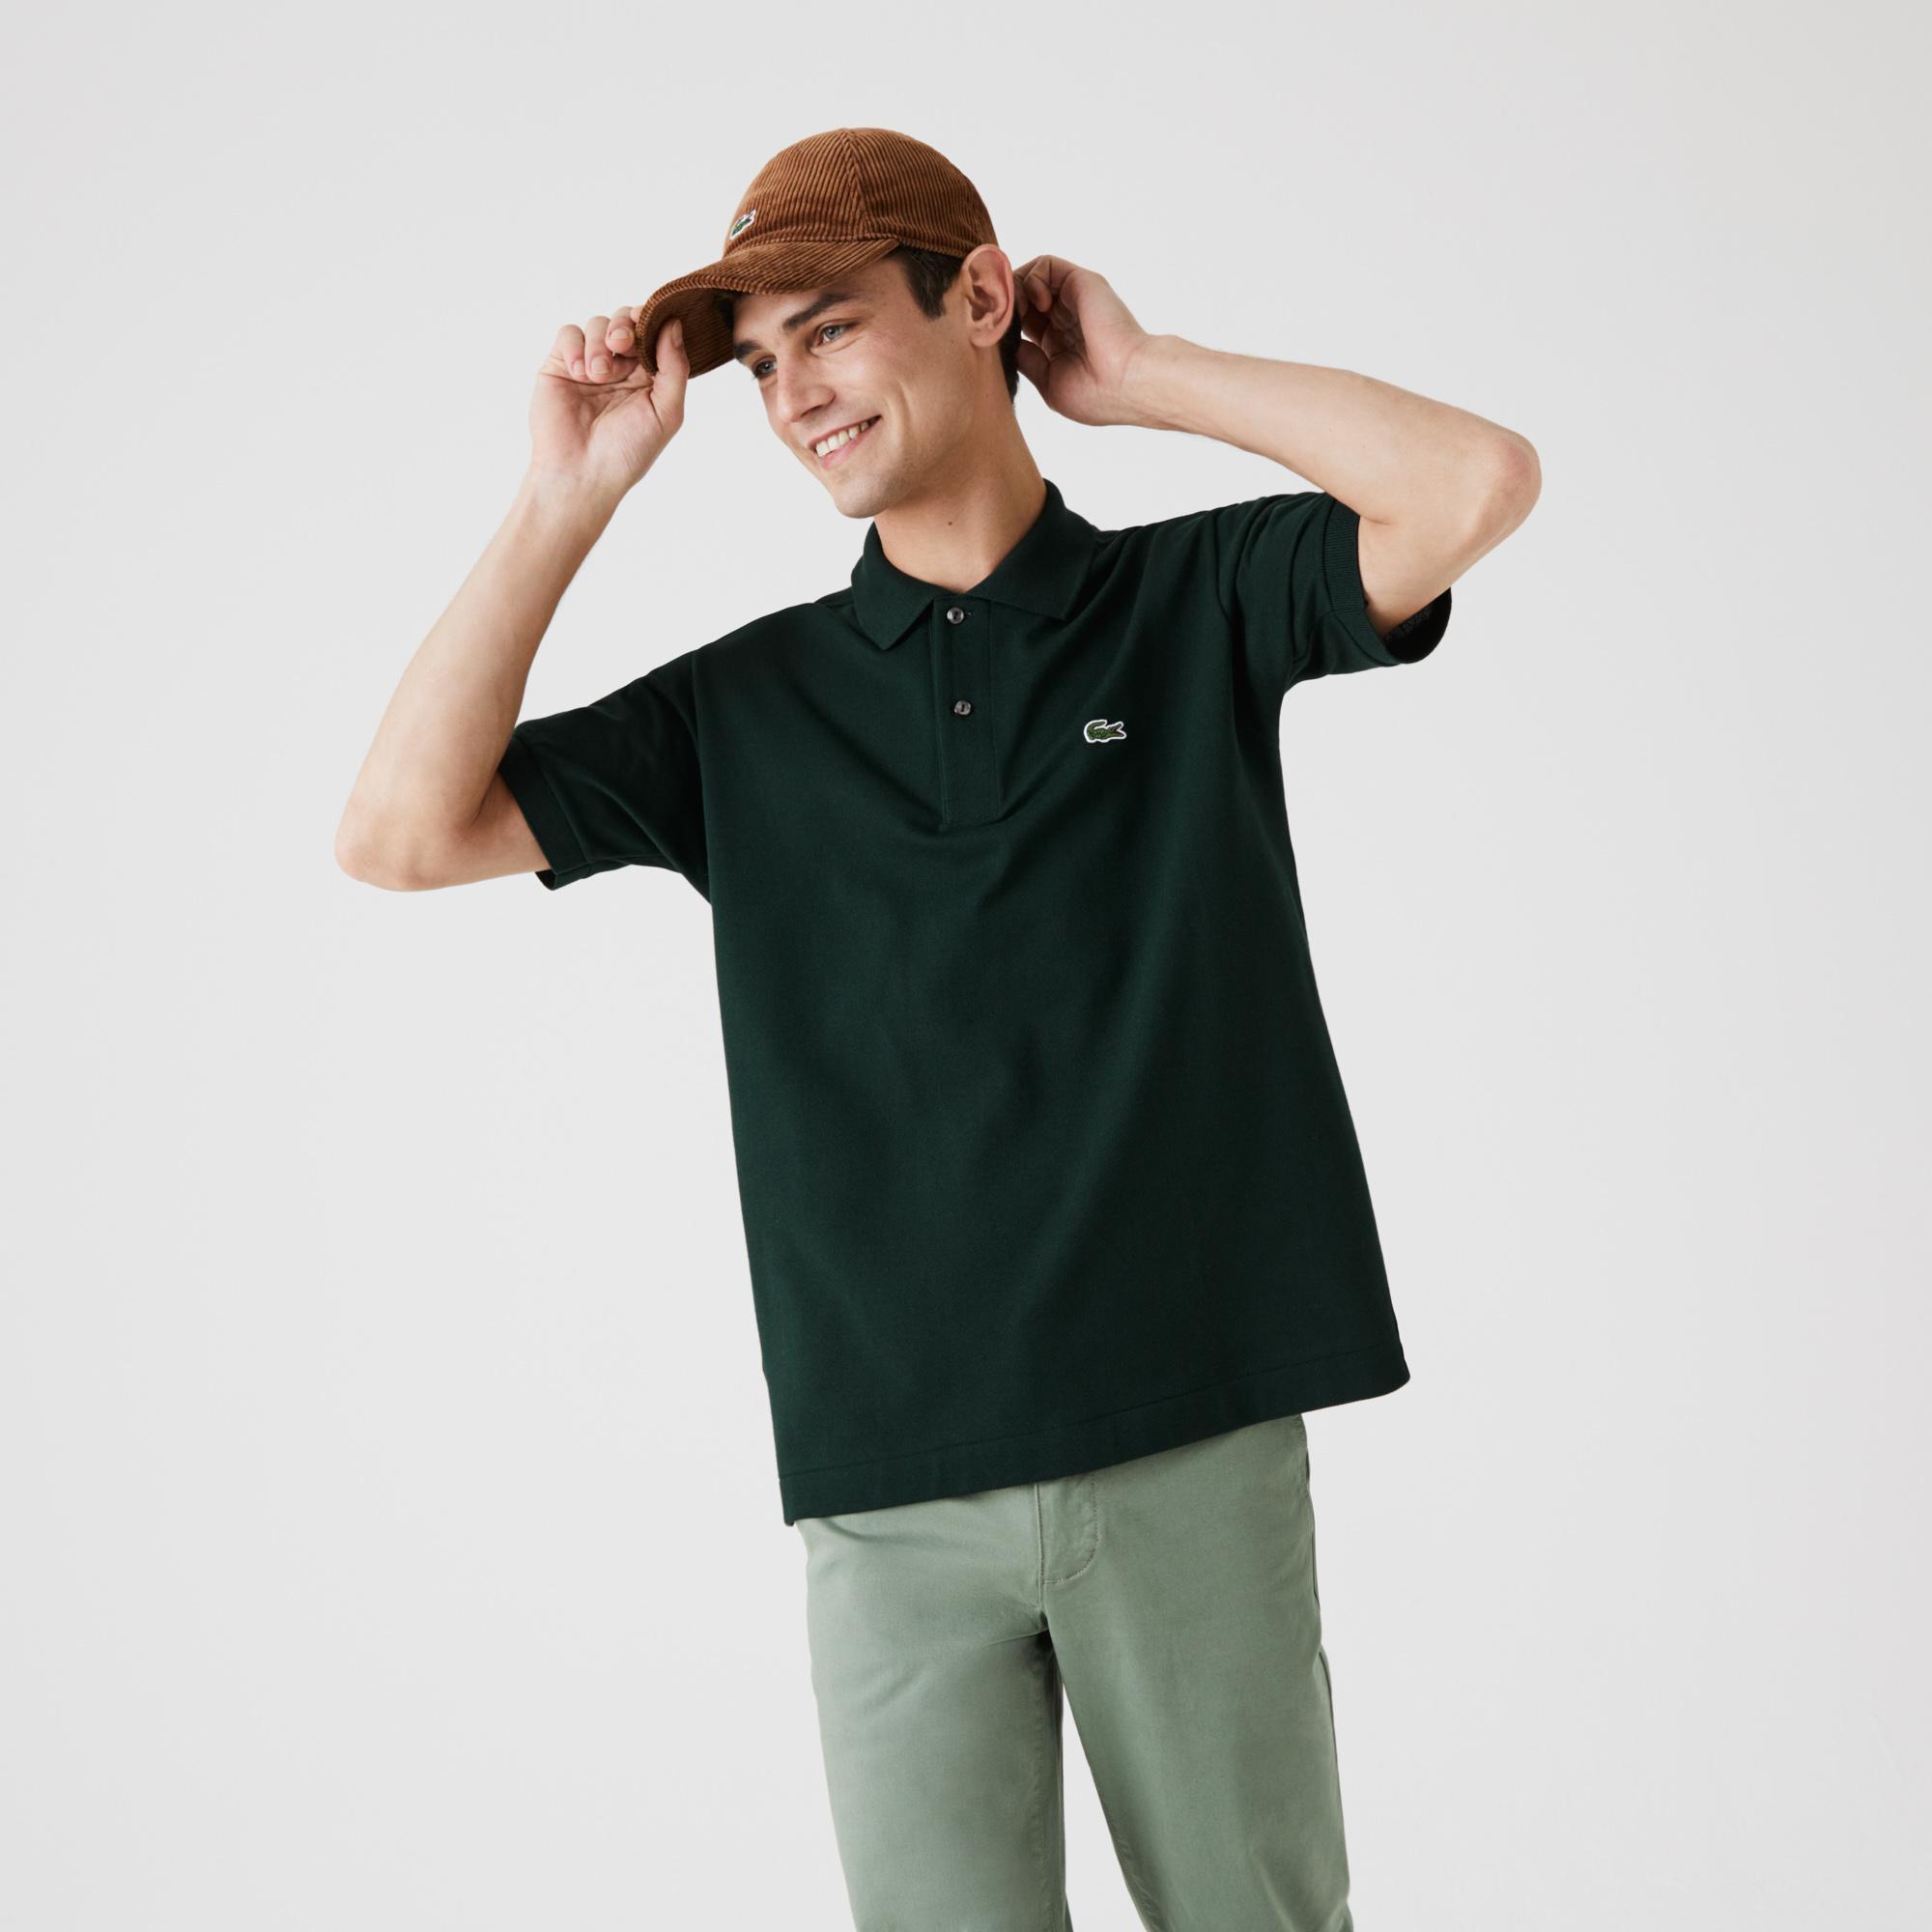 Lacoste Classic Fit Polo, Grøn, L